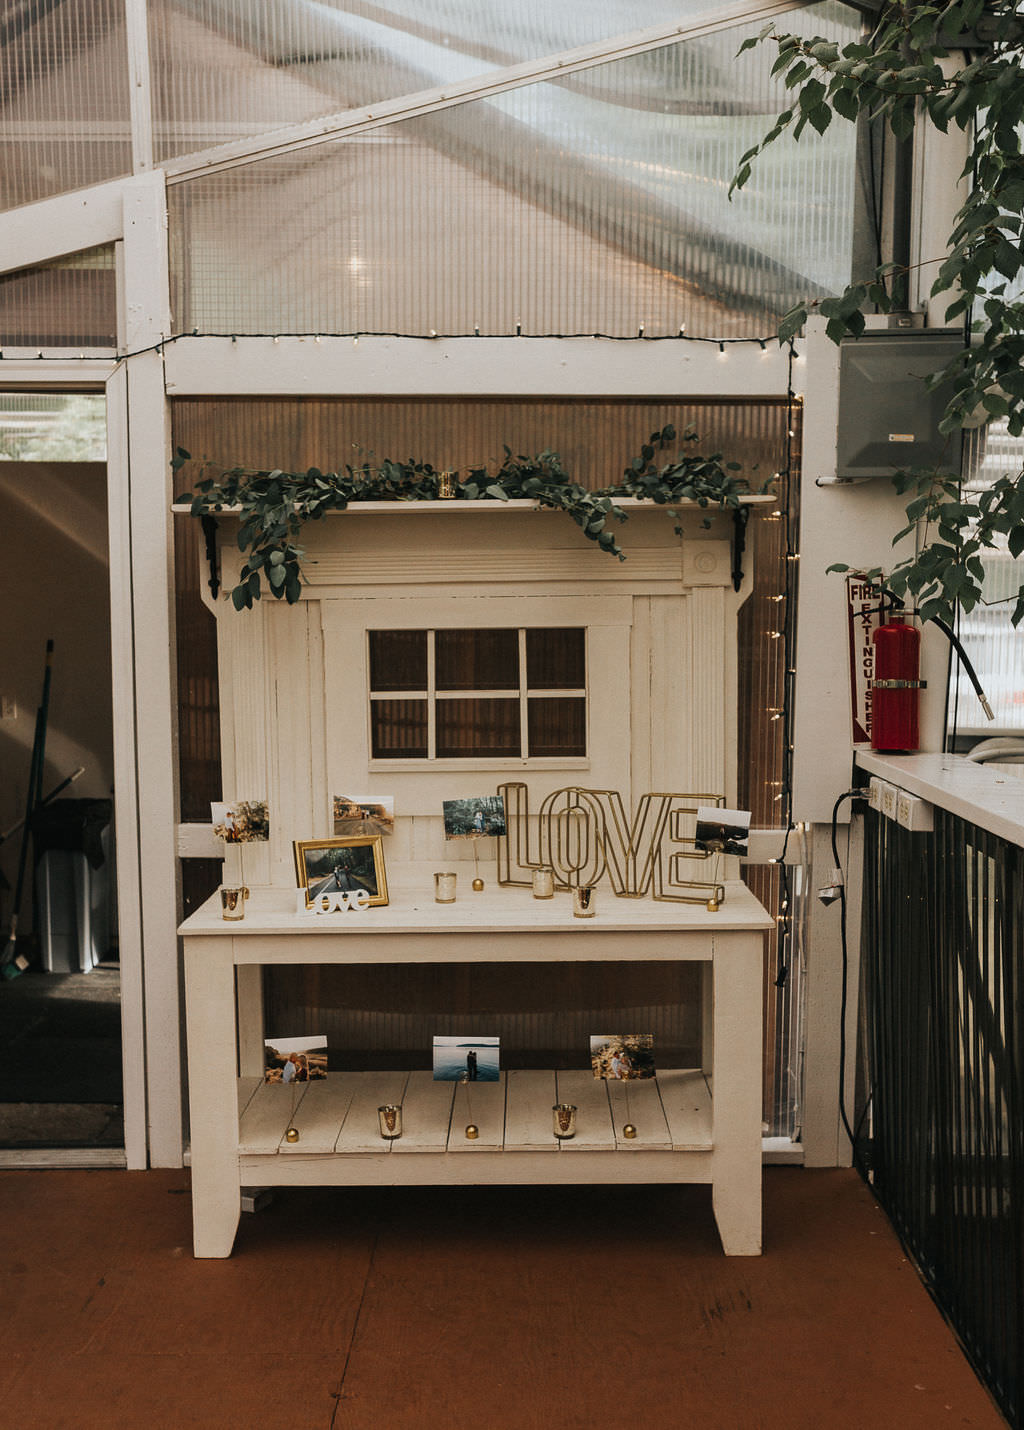 Furniture Dresser Decor Table Greenhouse Garden Washington Wedding Beginning and End Photography